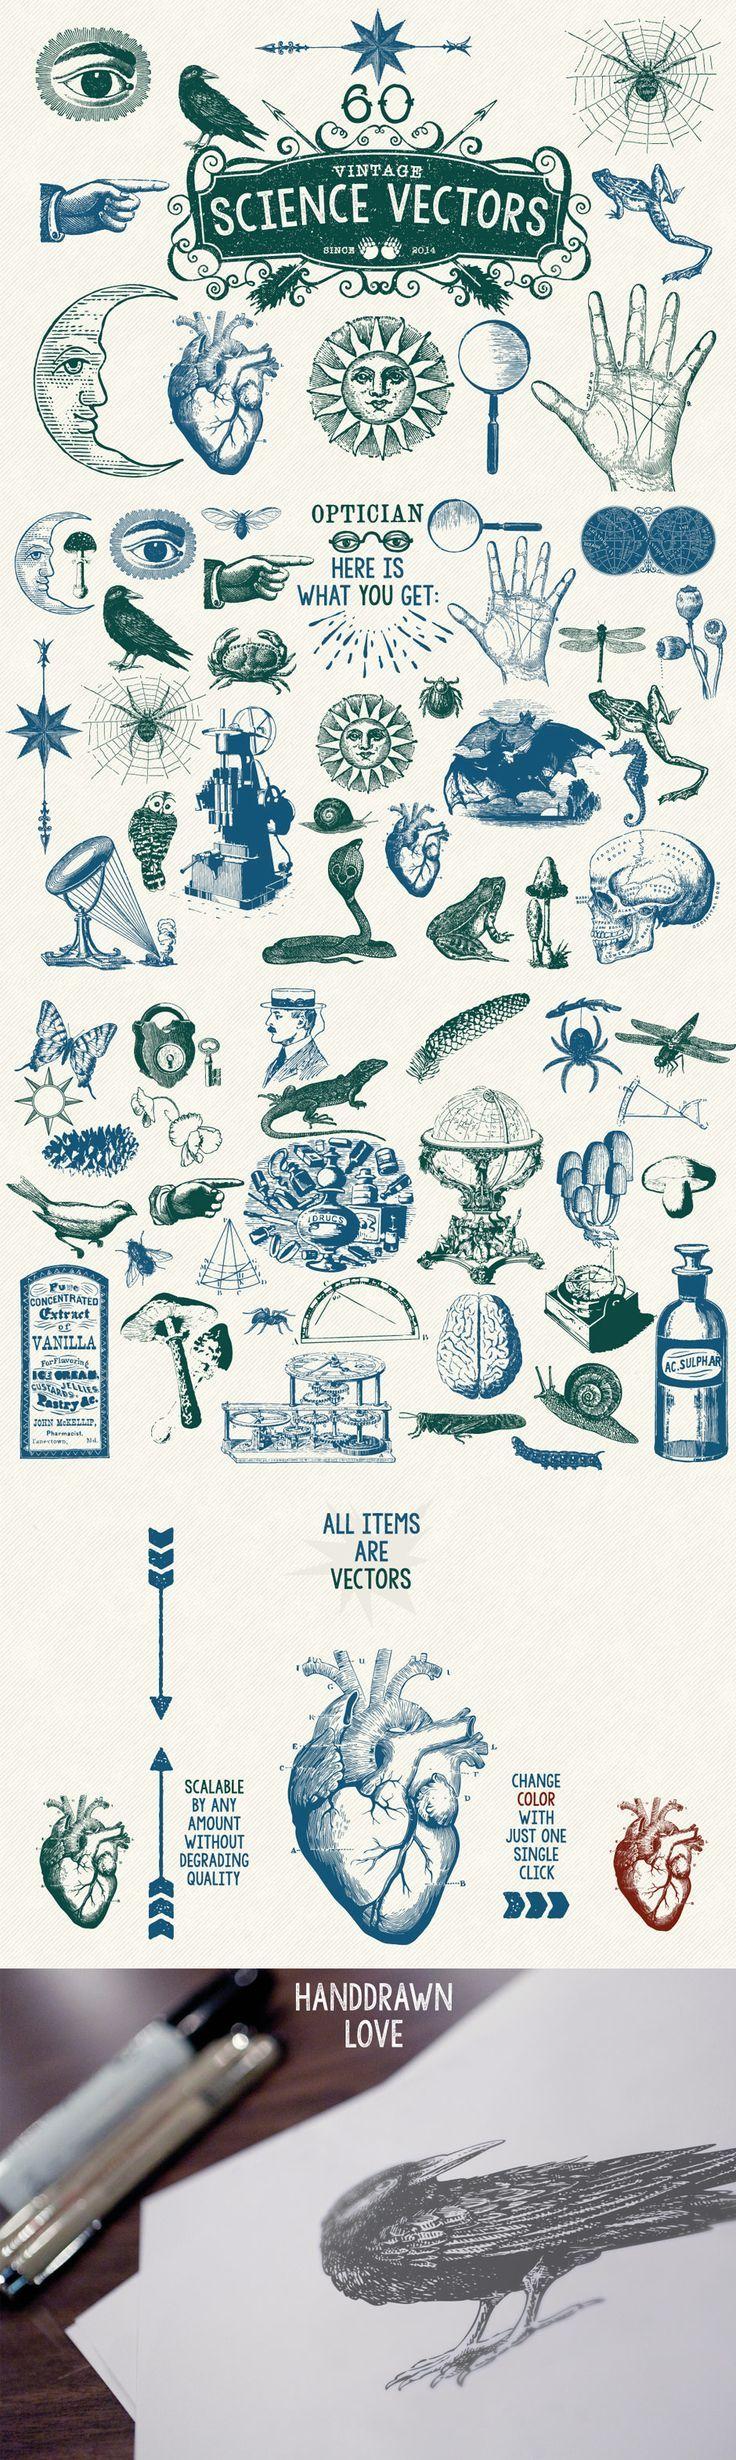 Typography  60 Vintage Science Vectors by MouseMade | The Comprehensive Creative Vectors Bu